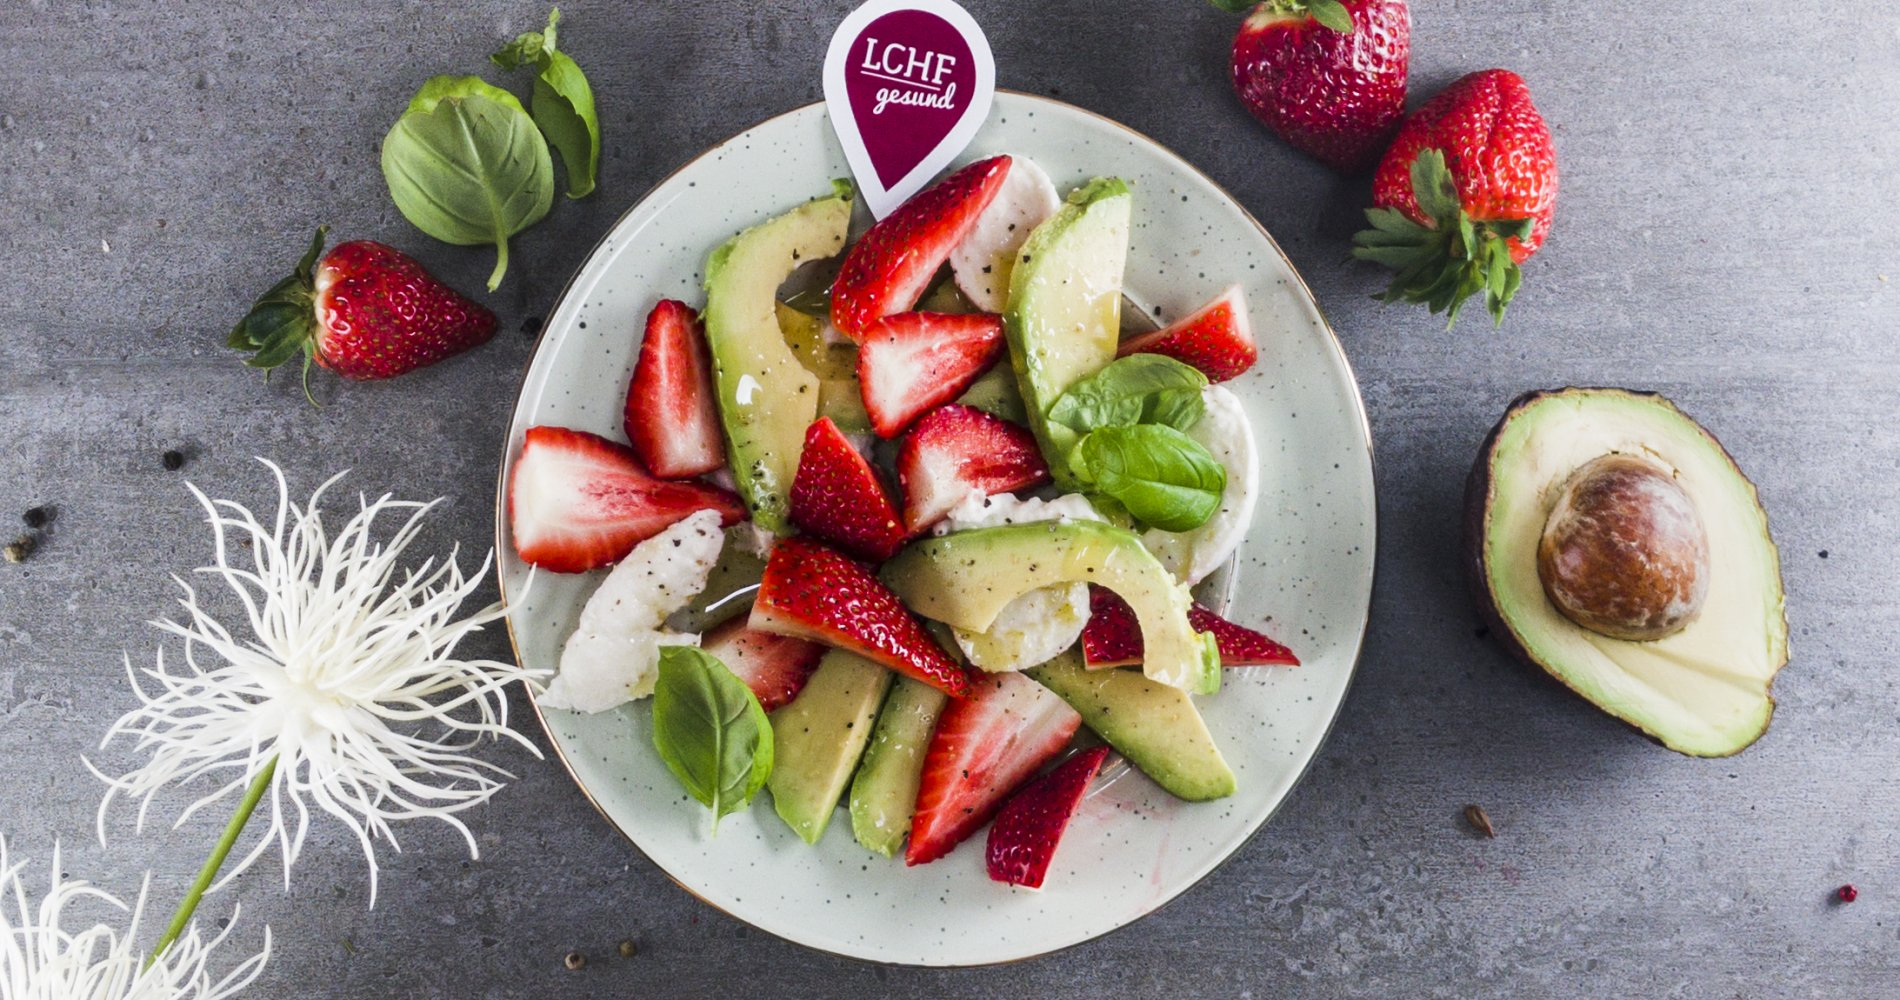 Rezept Low Carb: Fruchtiger Erdbeer-Avocado-Salat - LCHF-gesund.de